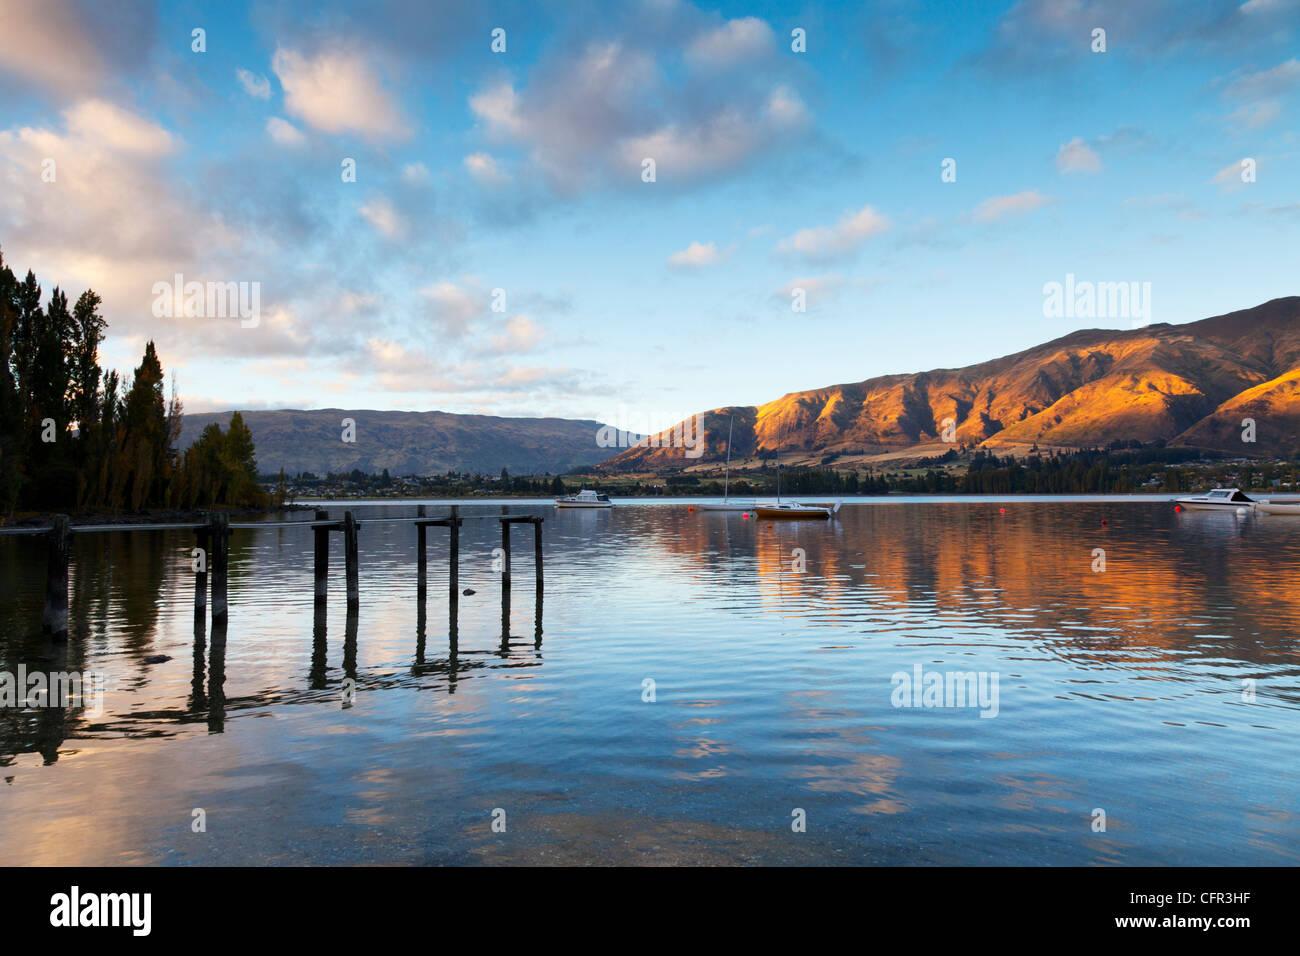 Am frühen Morgen am Lake Wanaka, Otago, Neuseeland. Stockfoto